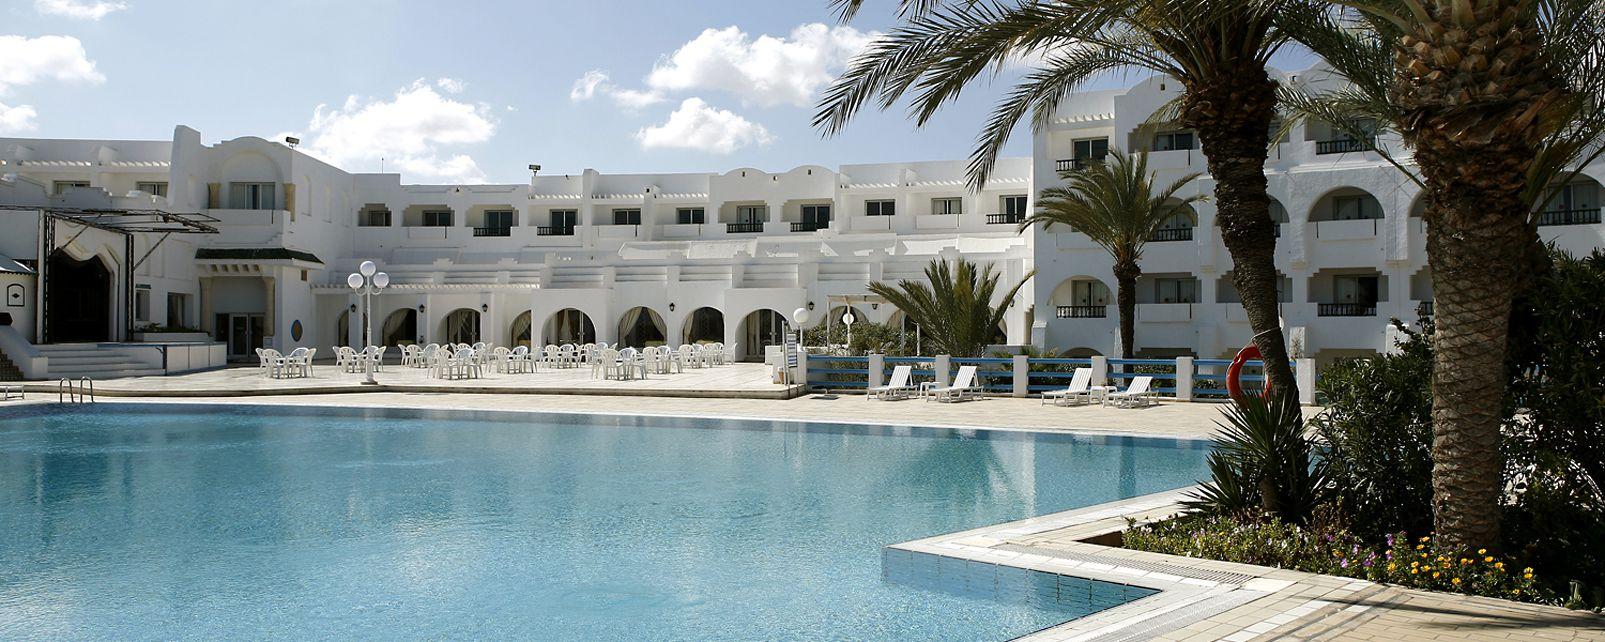 Baya Beach Aqua Park Resort & Thalasso, Djerba Midoun